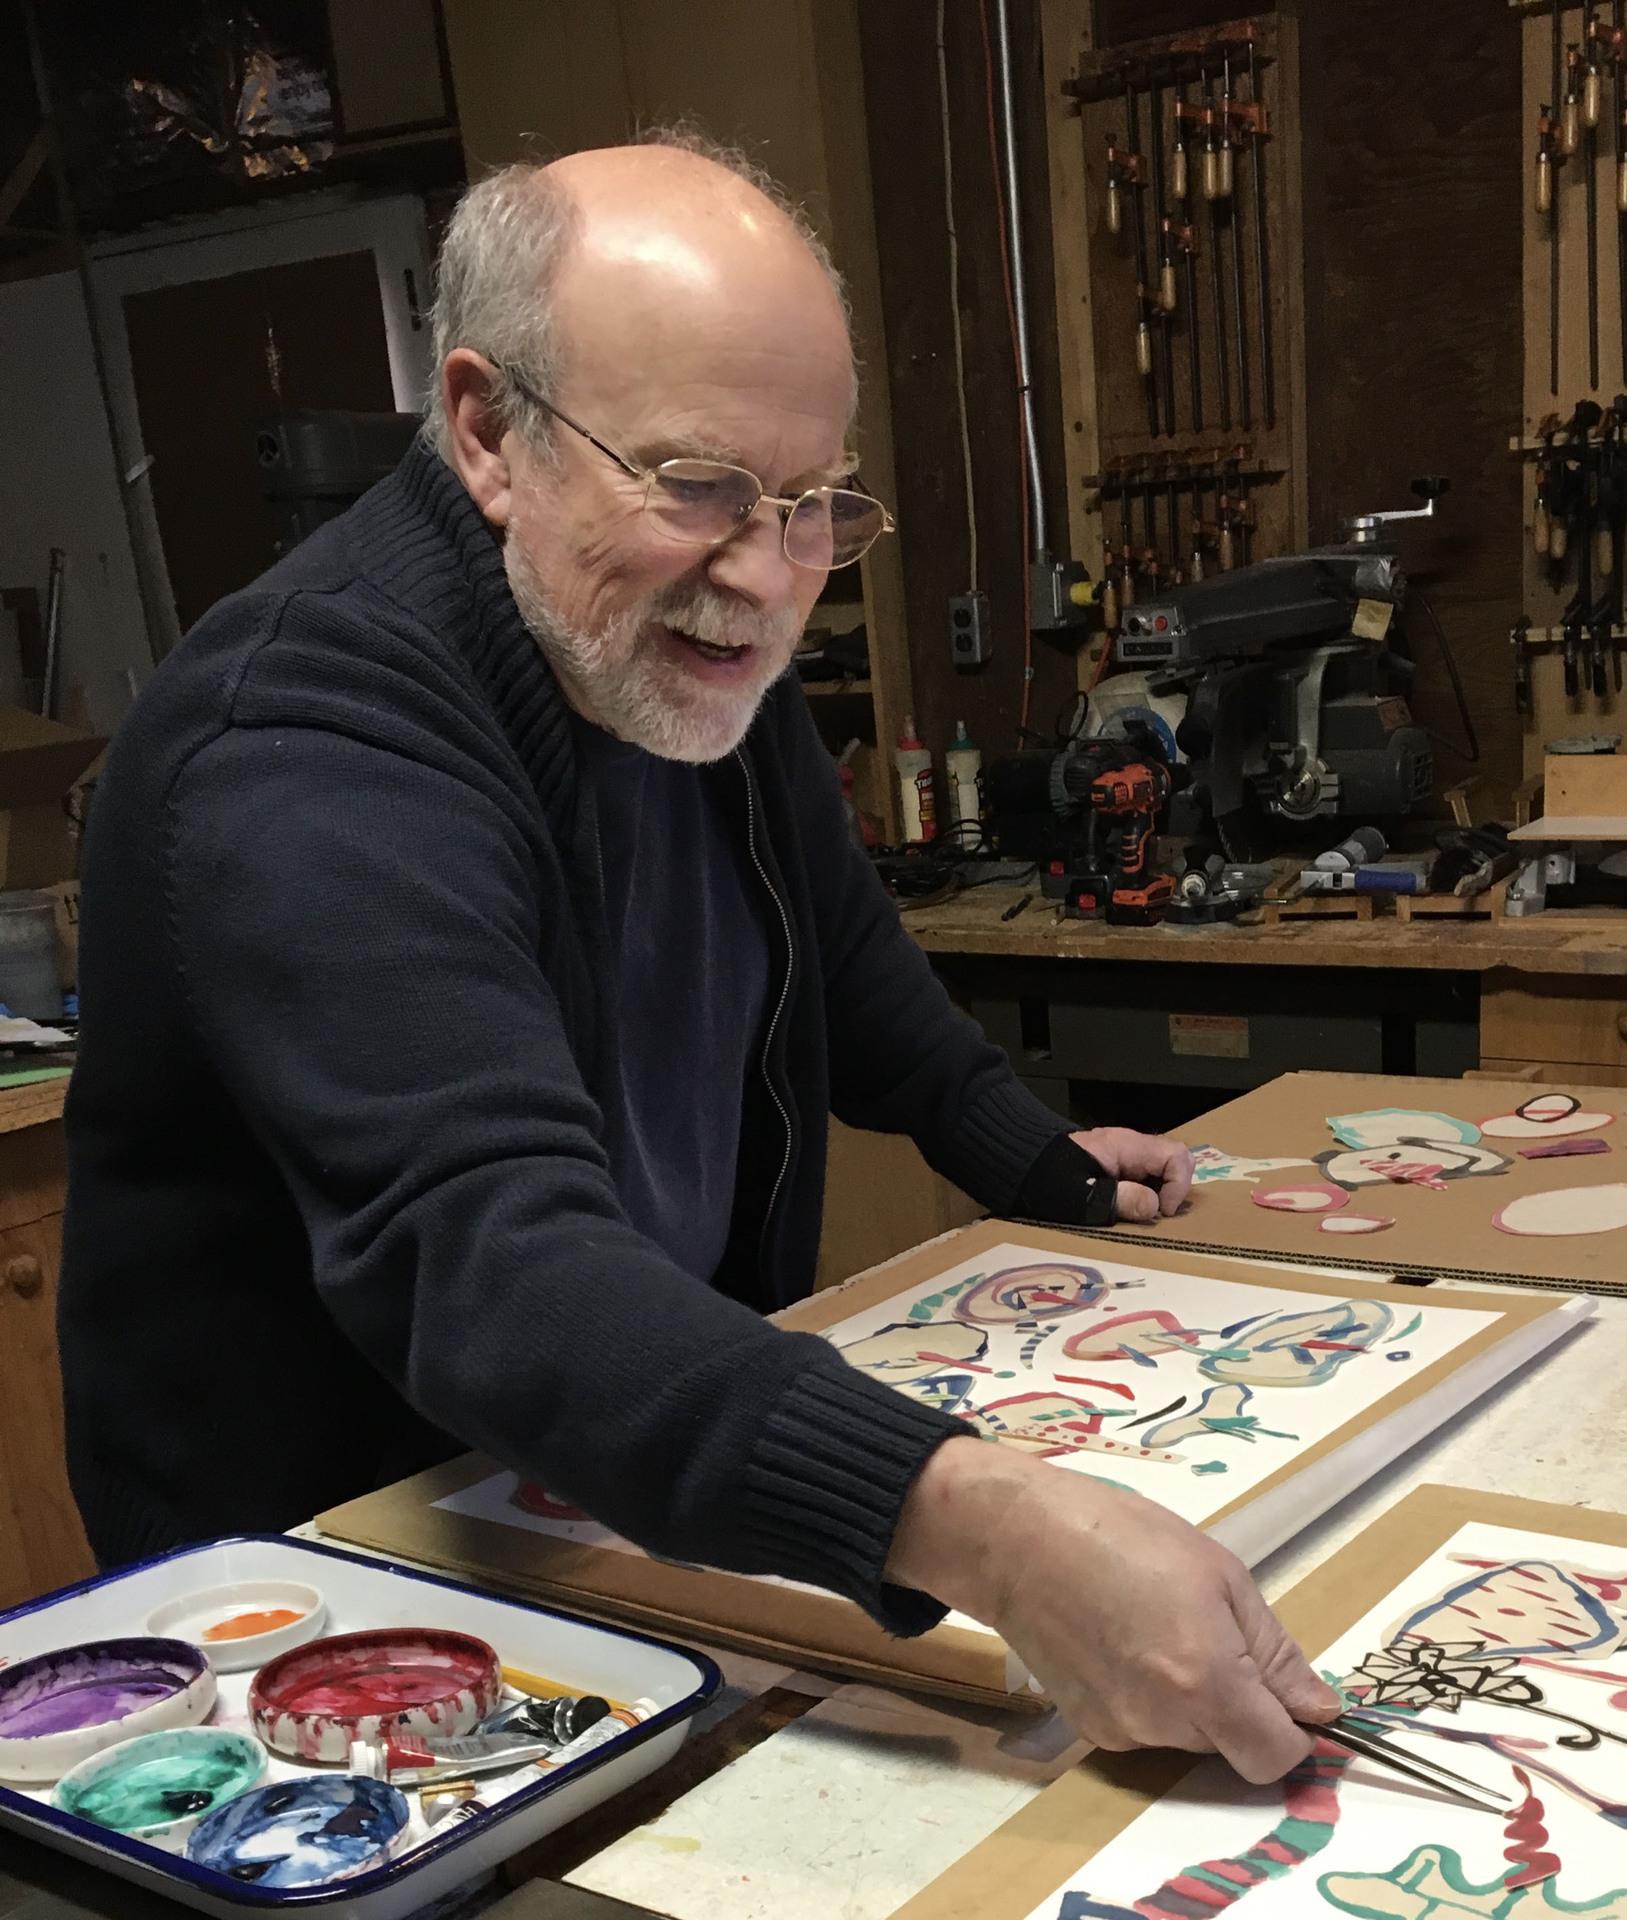 Michael McFadden • Artist in studio • Photograph • 6 x 4 x .1 Inches • 2019